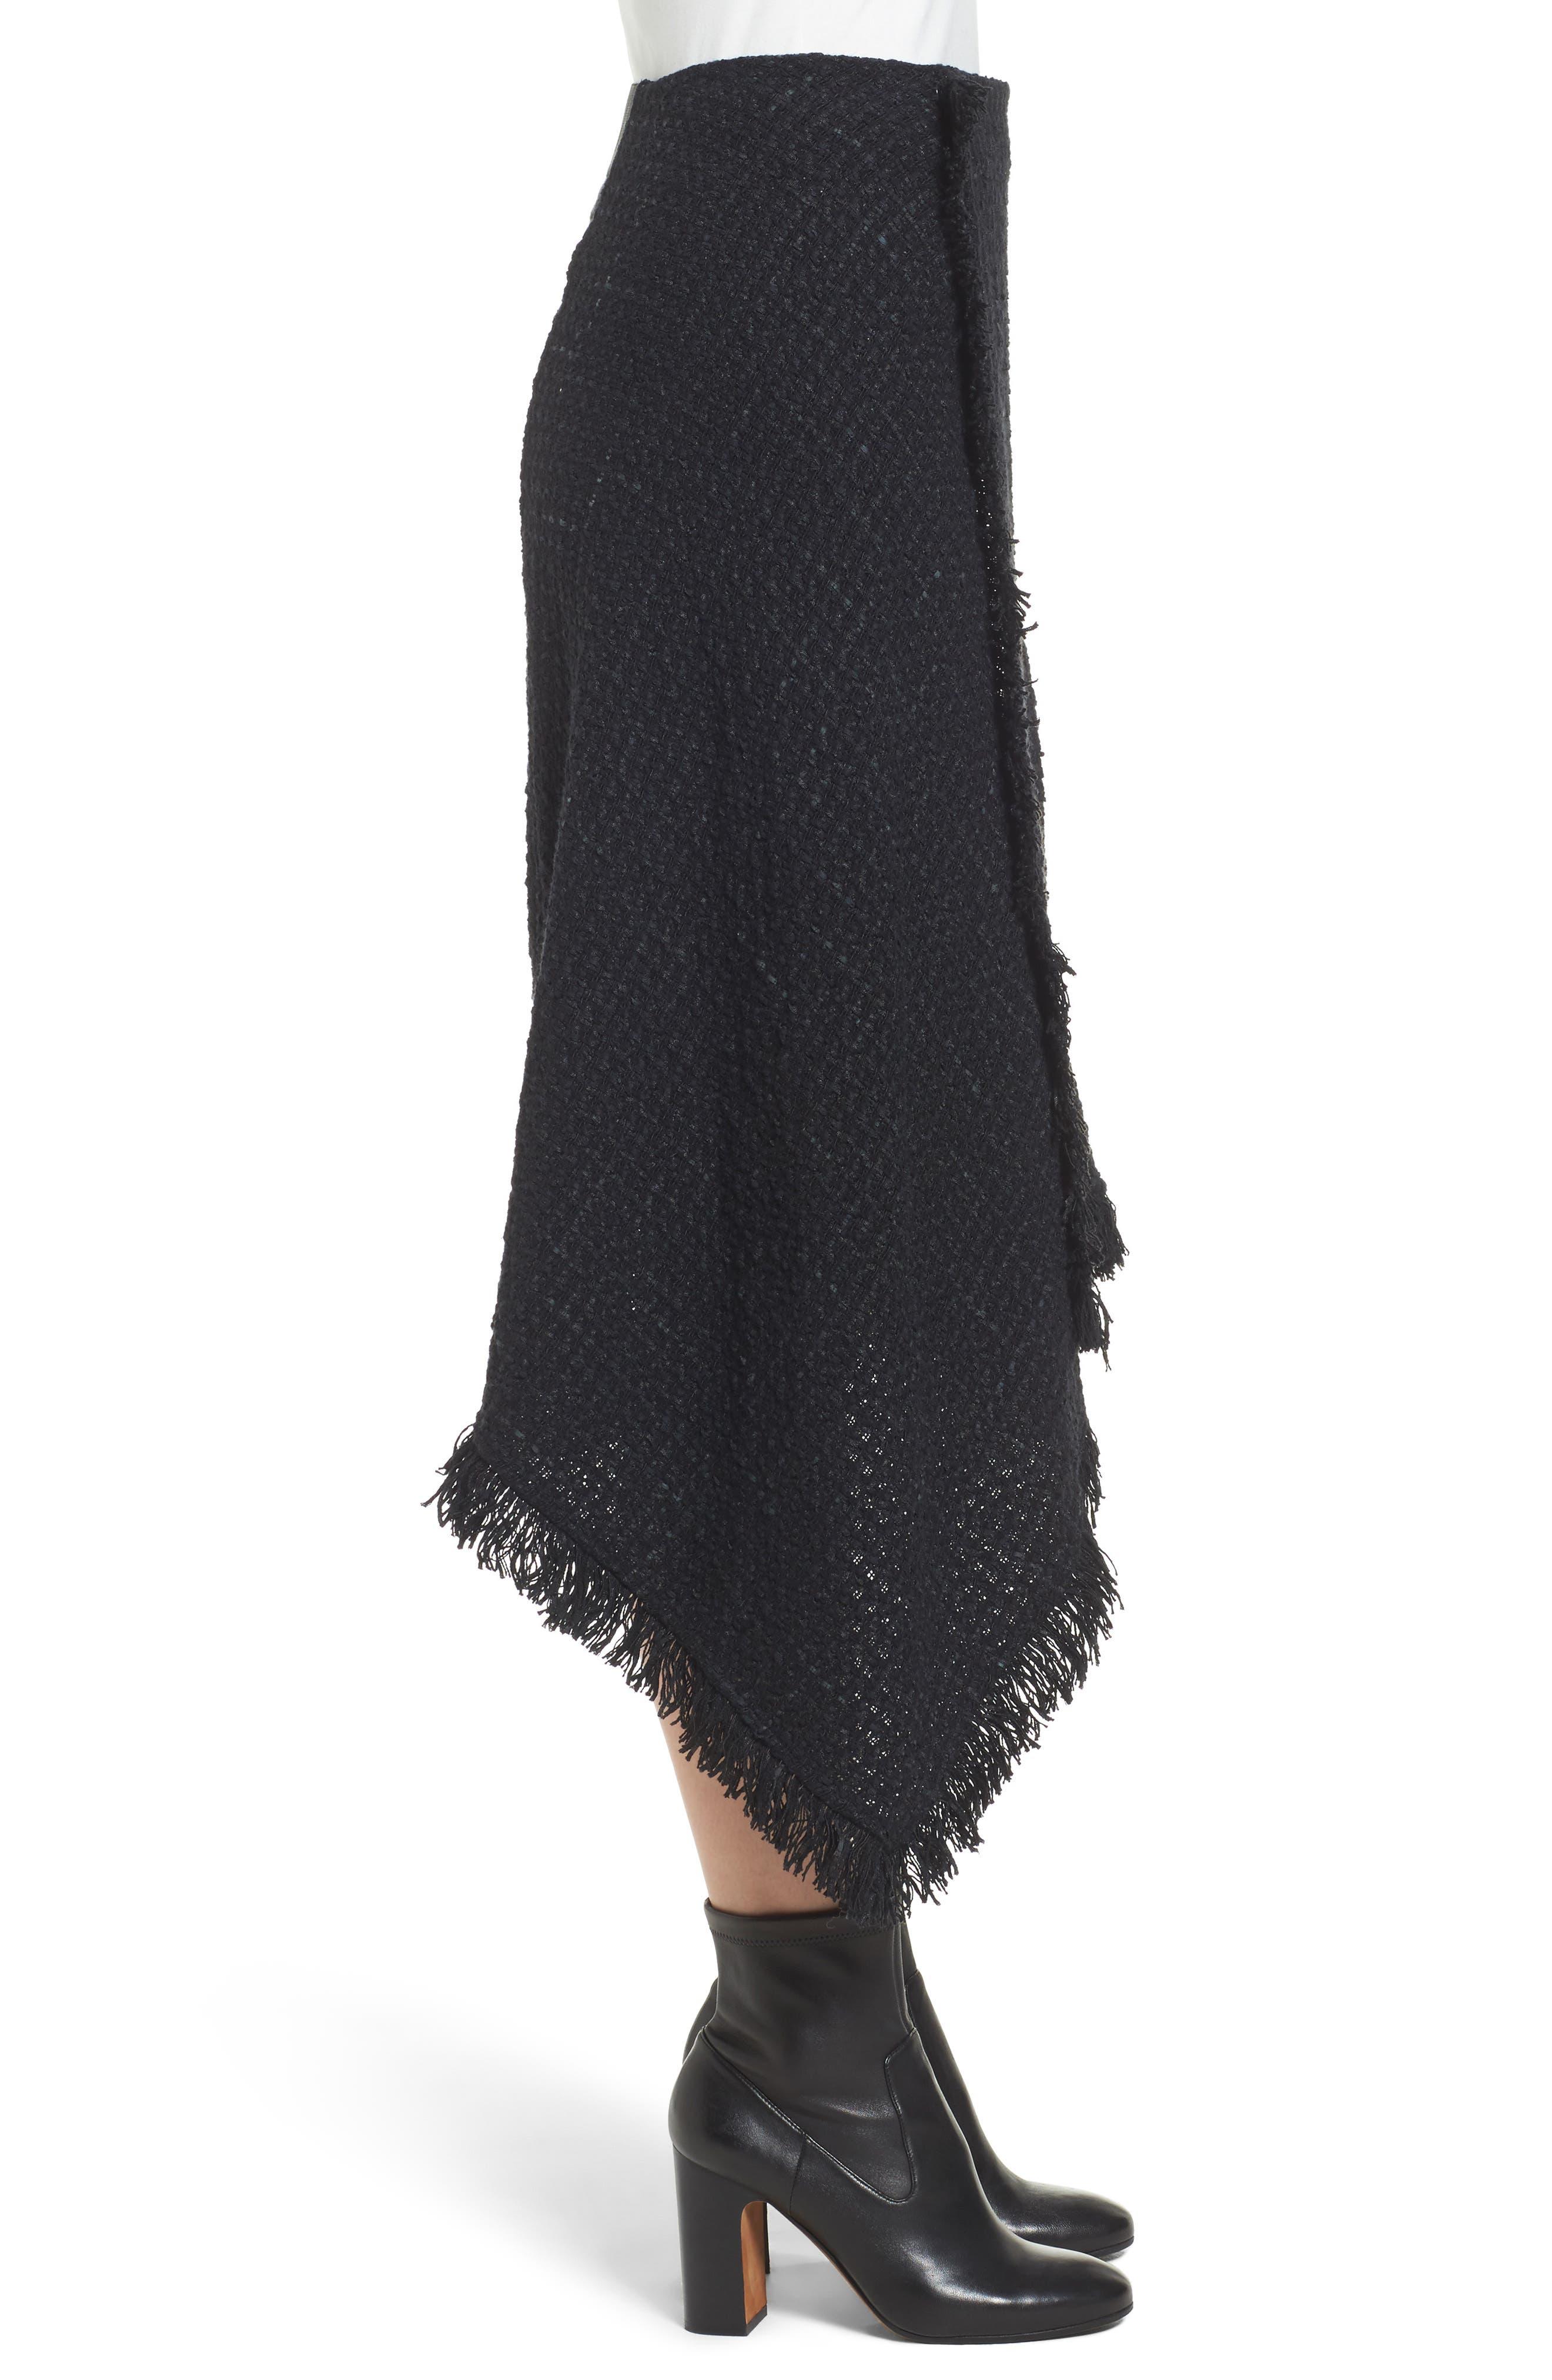 NIC + ZOE Majestic Tweed Skirt,                             Alternate thumbnail 3, color,                             004